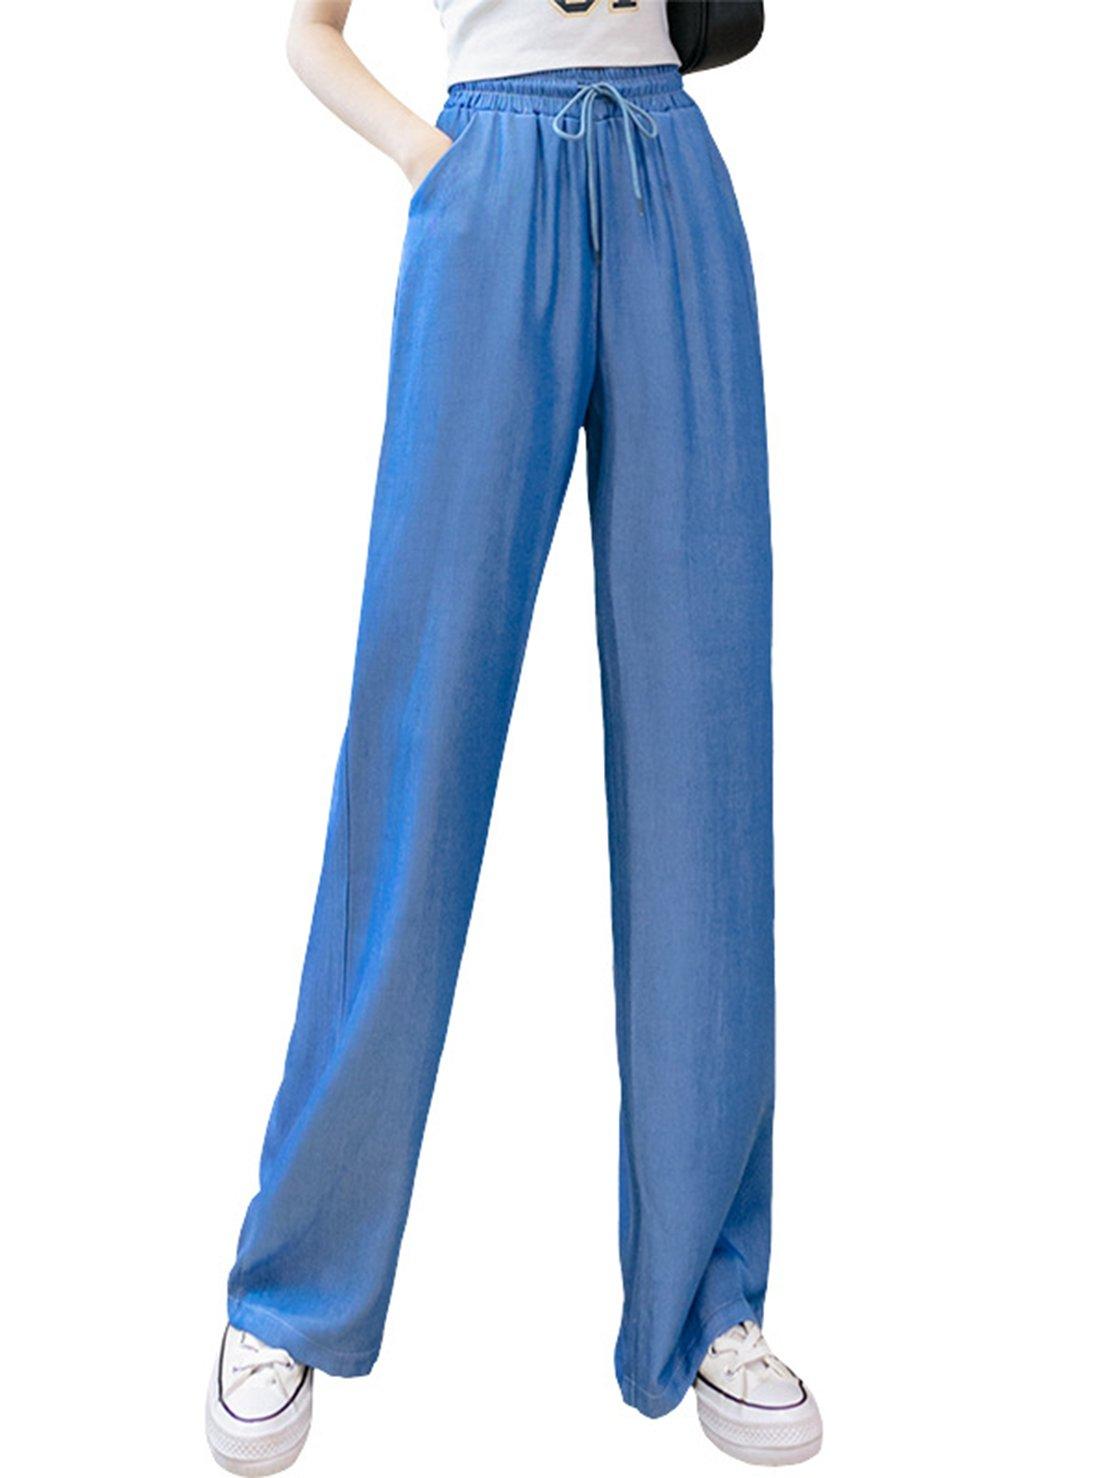 Drawstring Ladies' Jeans